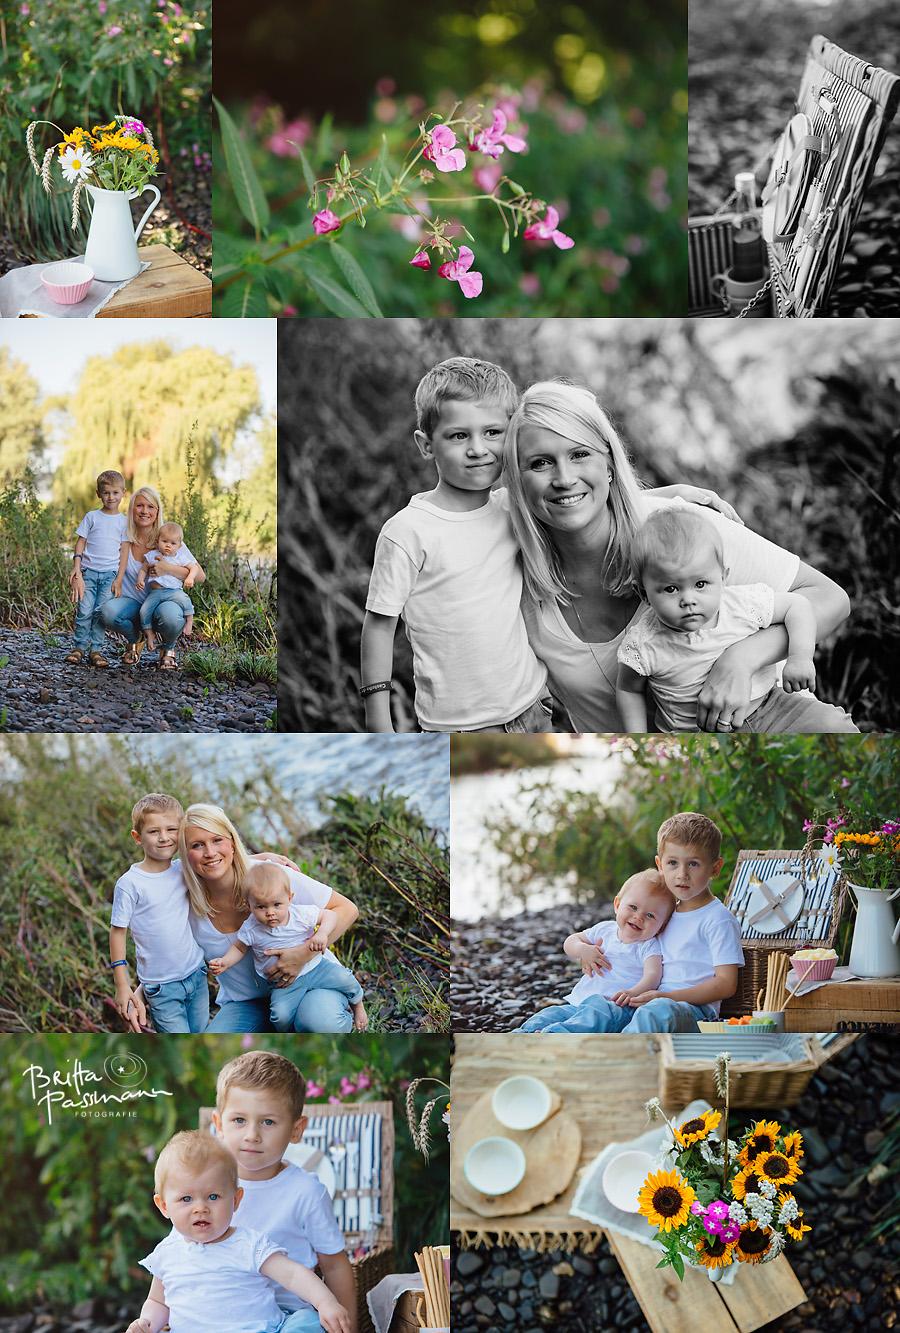 Familienpicknick_Fotoshooting_Familienfotos_Kinderfotos_Dortmund_Schwerte_16